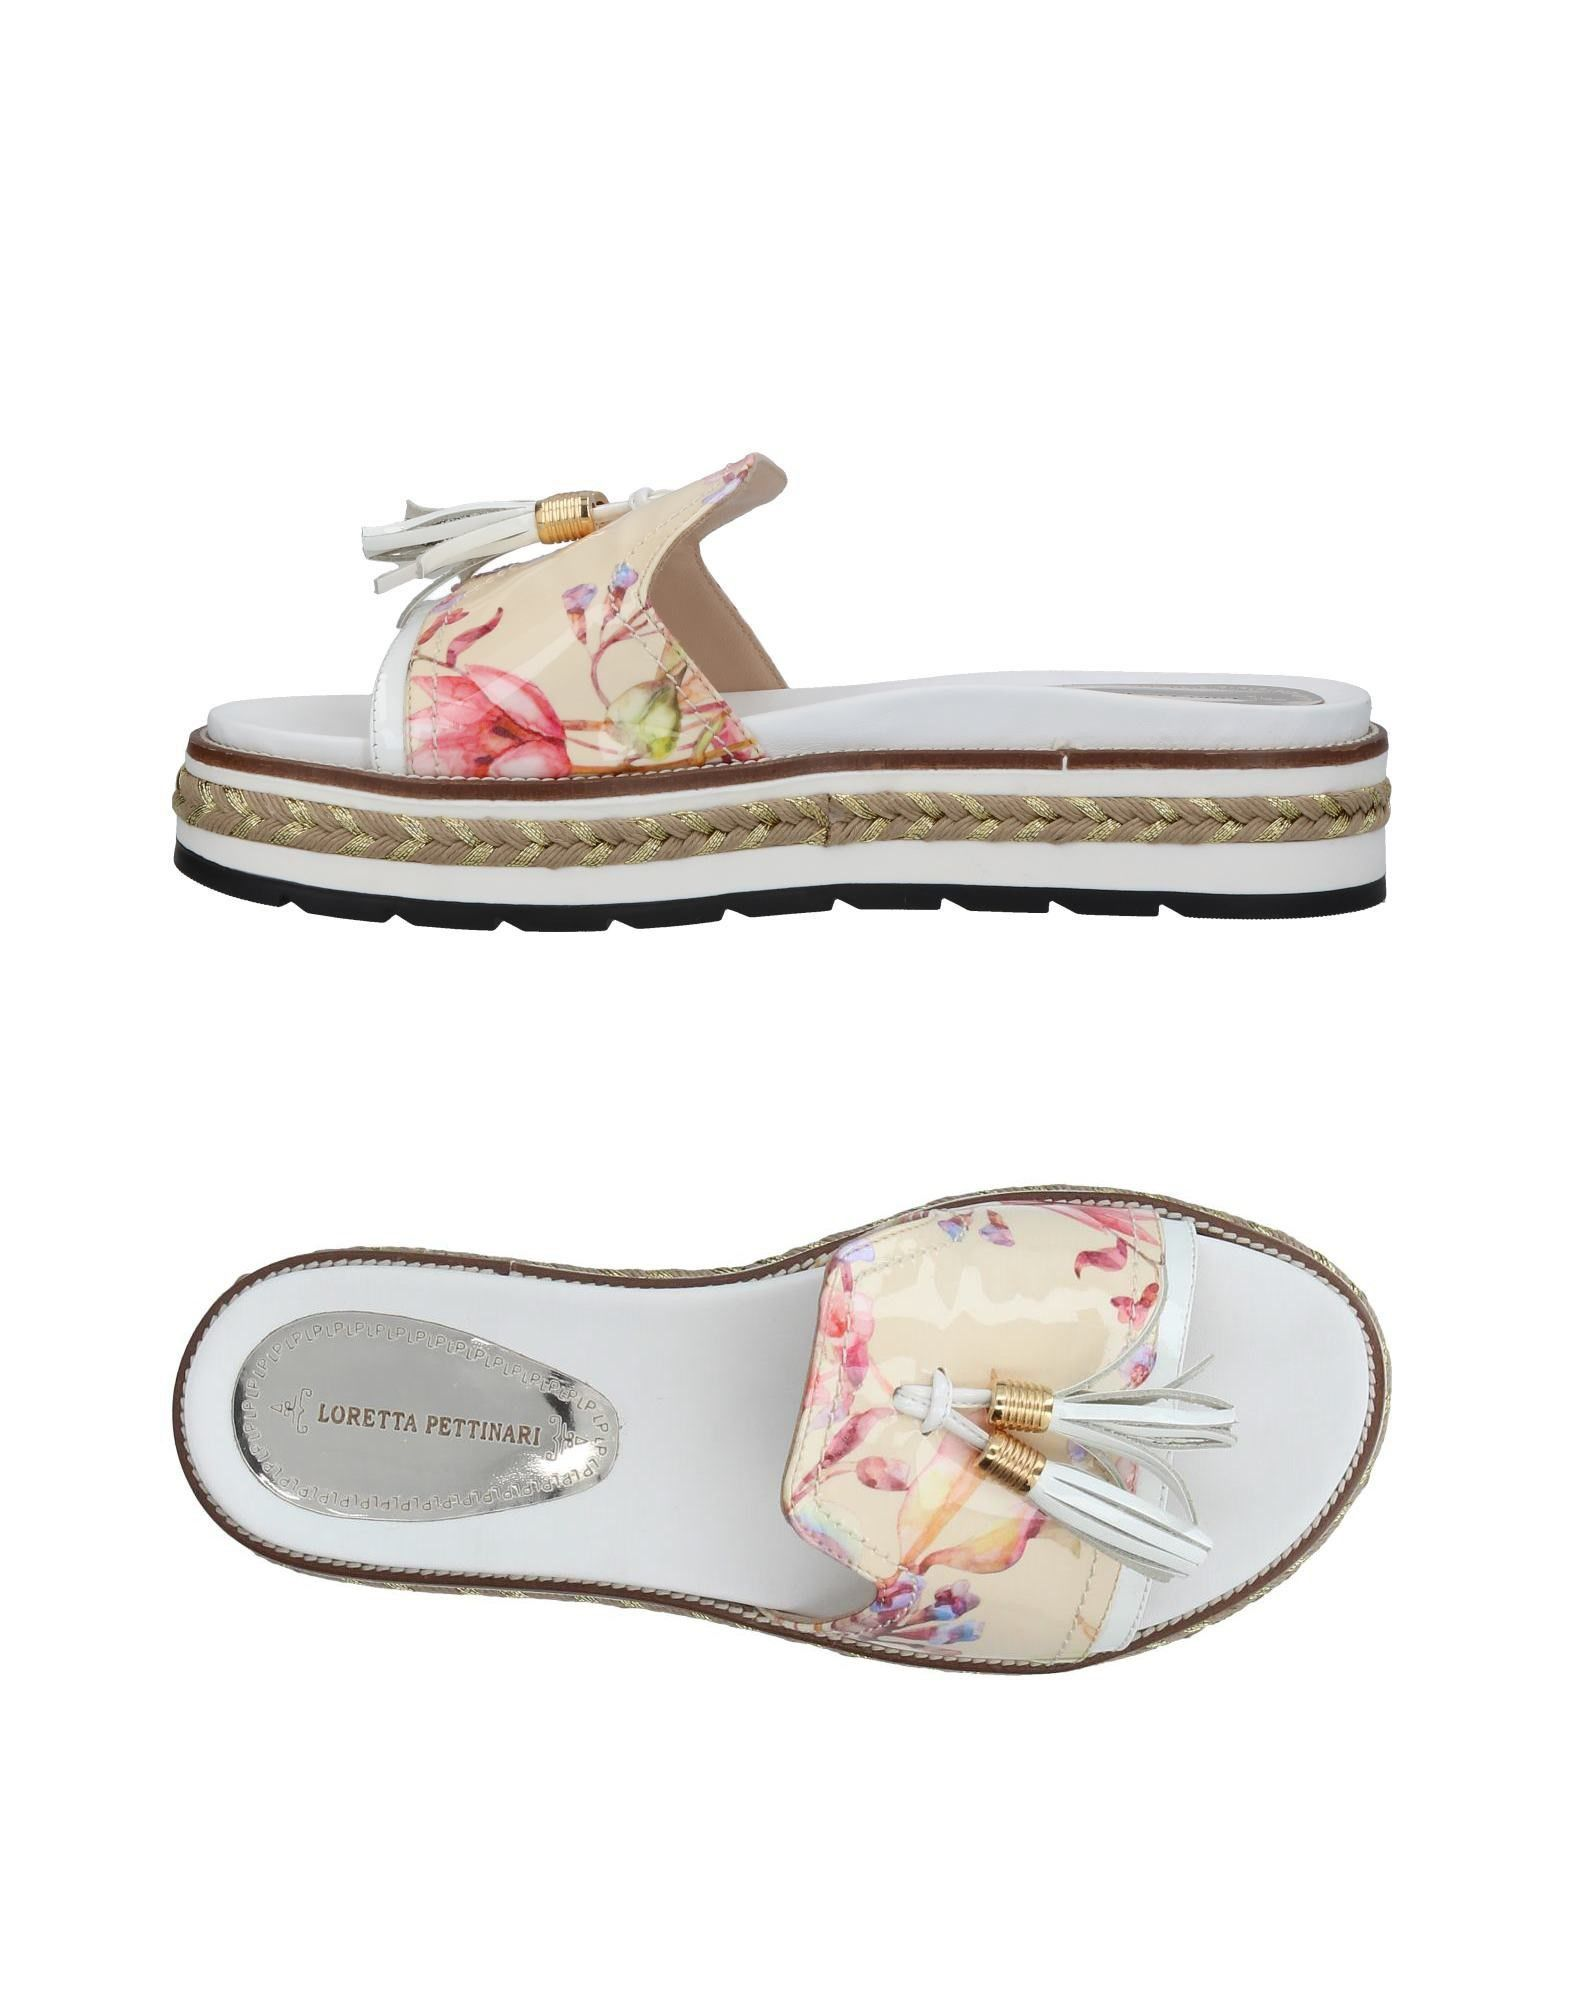 Loretta Pettinari Sandalen Damen  11387669DQ Gute Qualität beliebte Schuhe